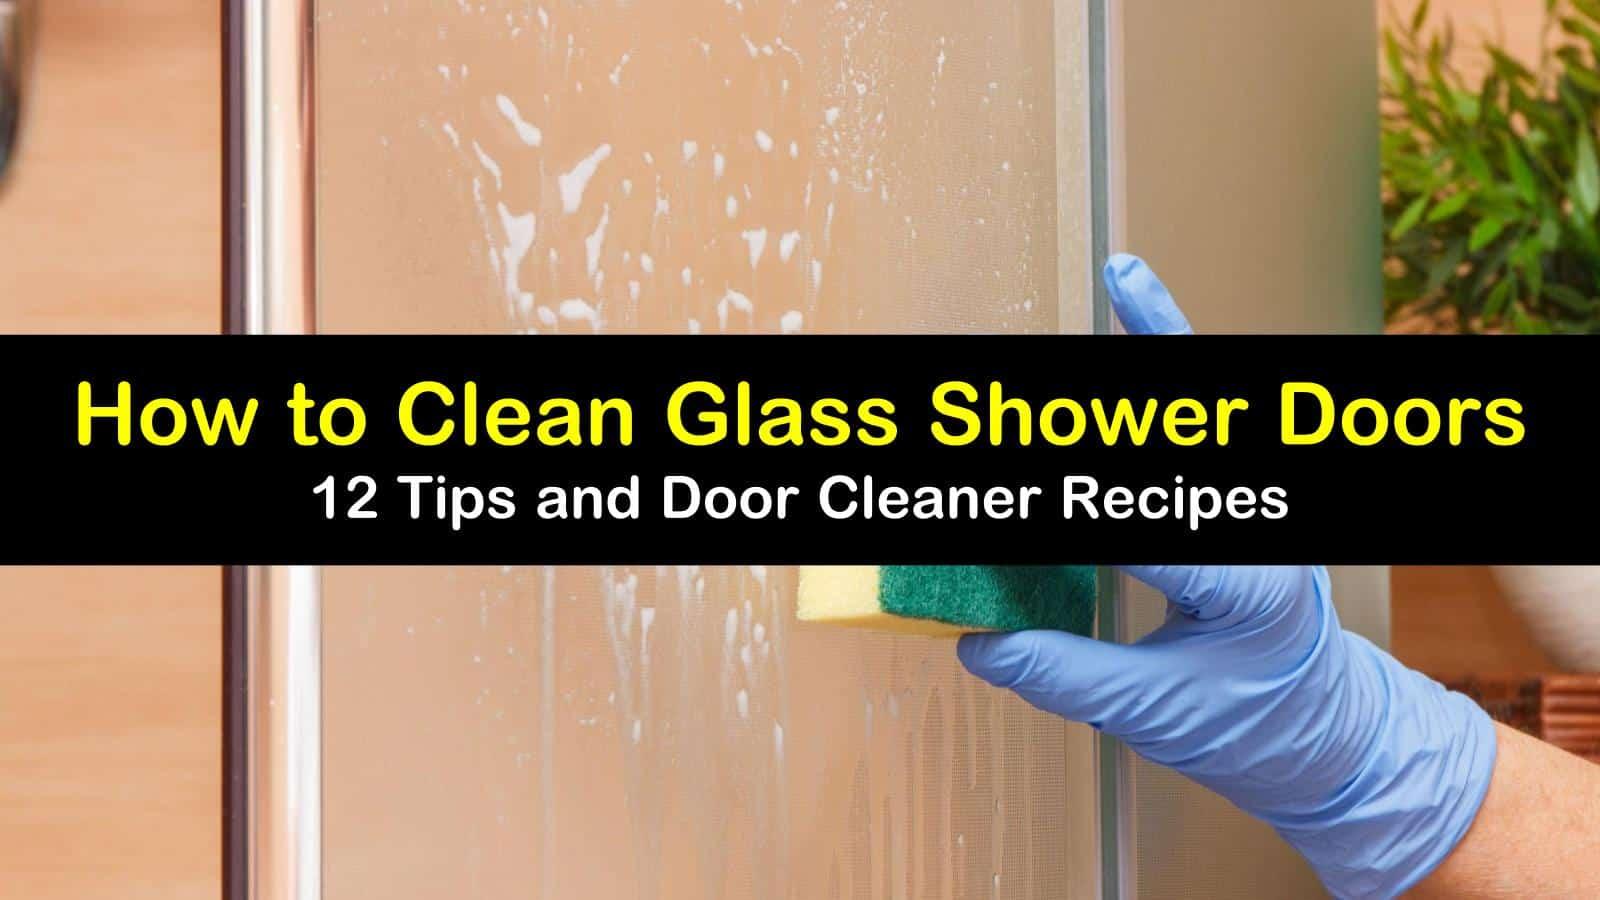 how to clean glass shower doors titleimg1